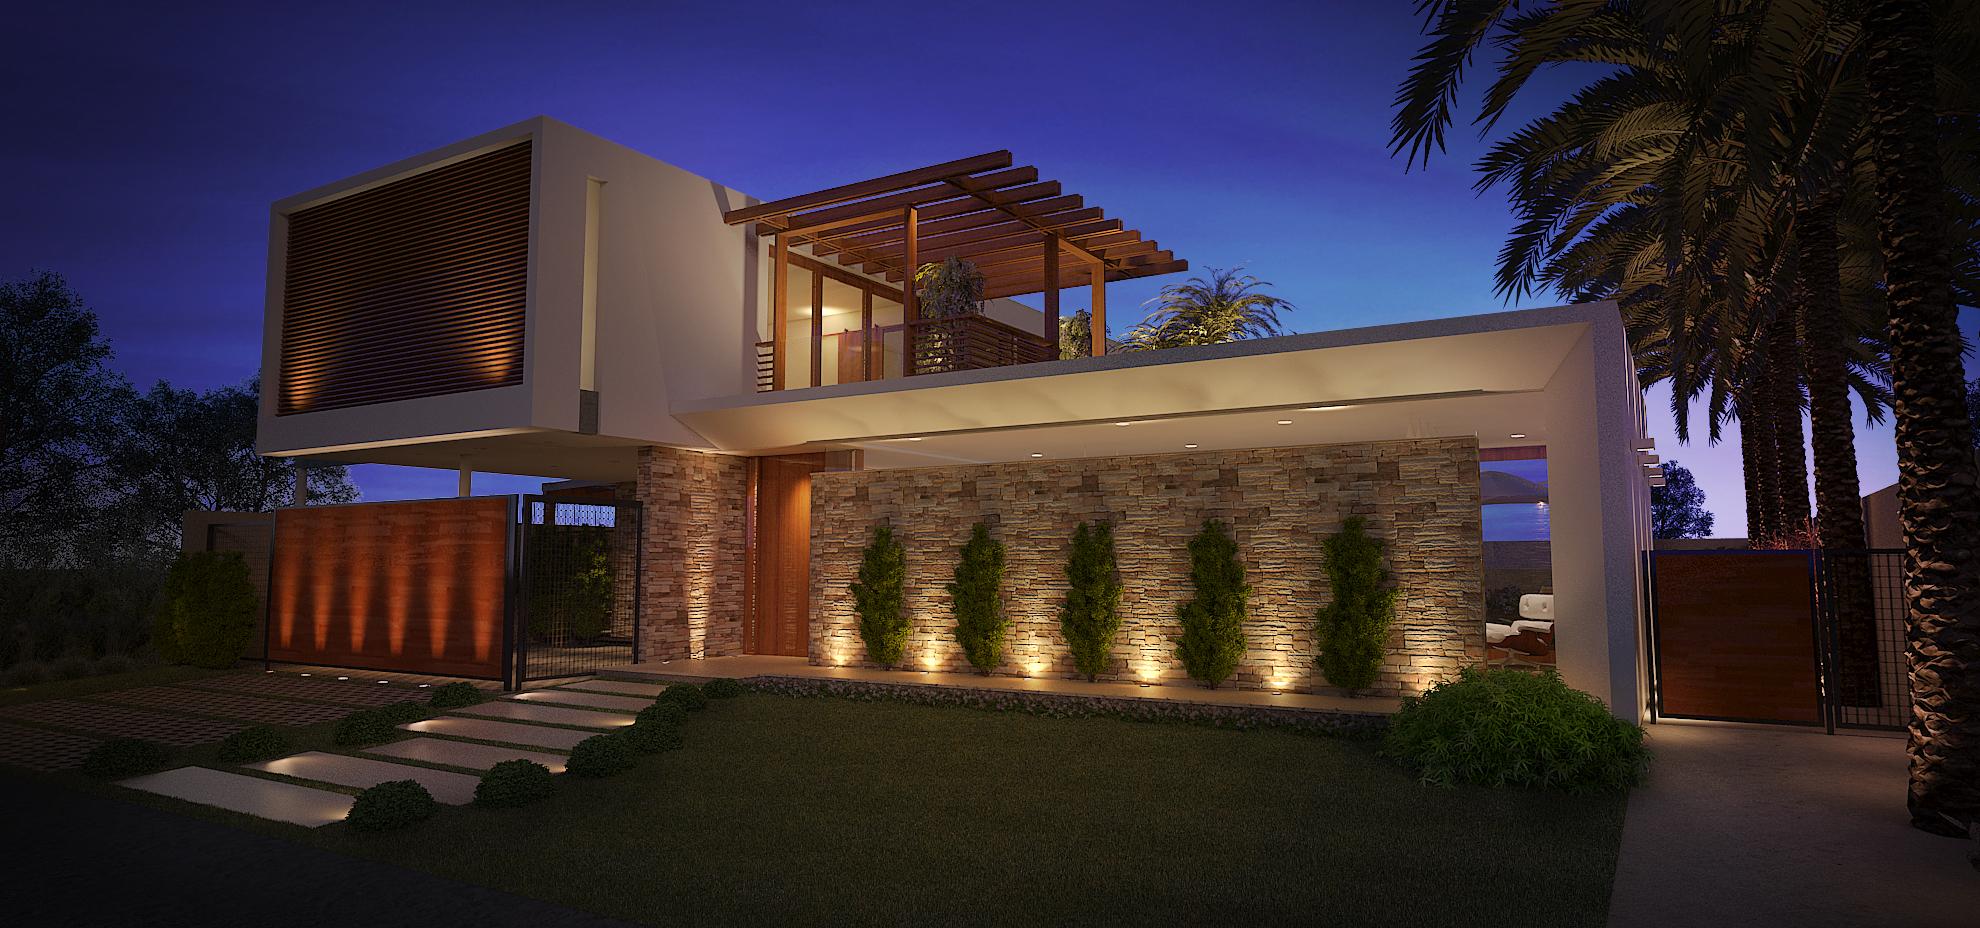 Casa Green Hills - Fachada Frontal